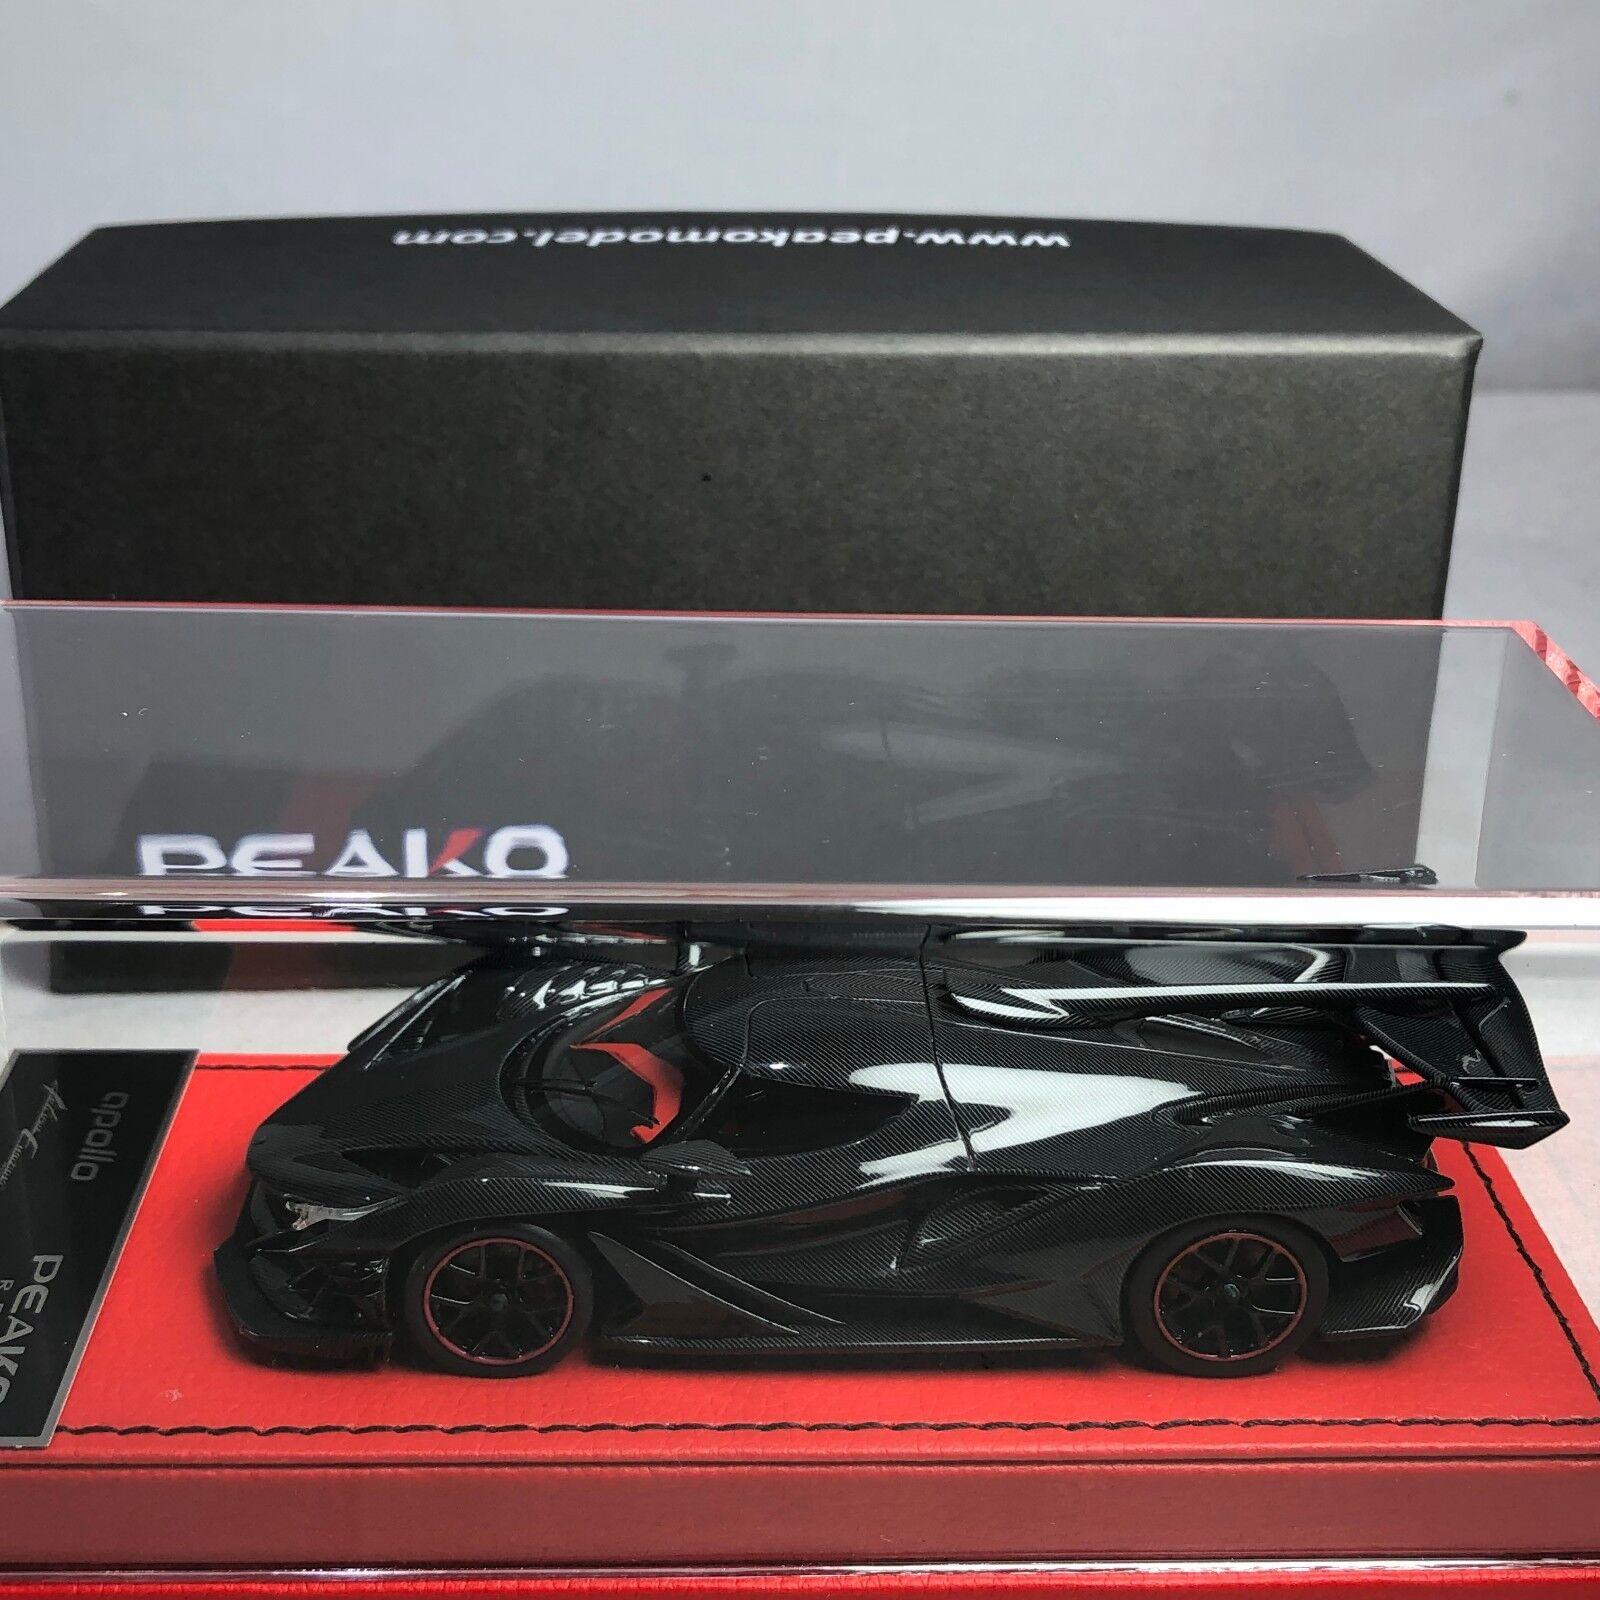 1 43 Escala Modelo Peako Apolo IE todo de carbono Ltd 100 piezas